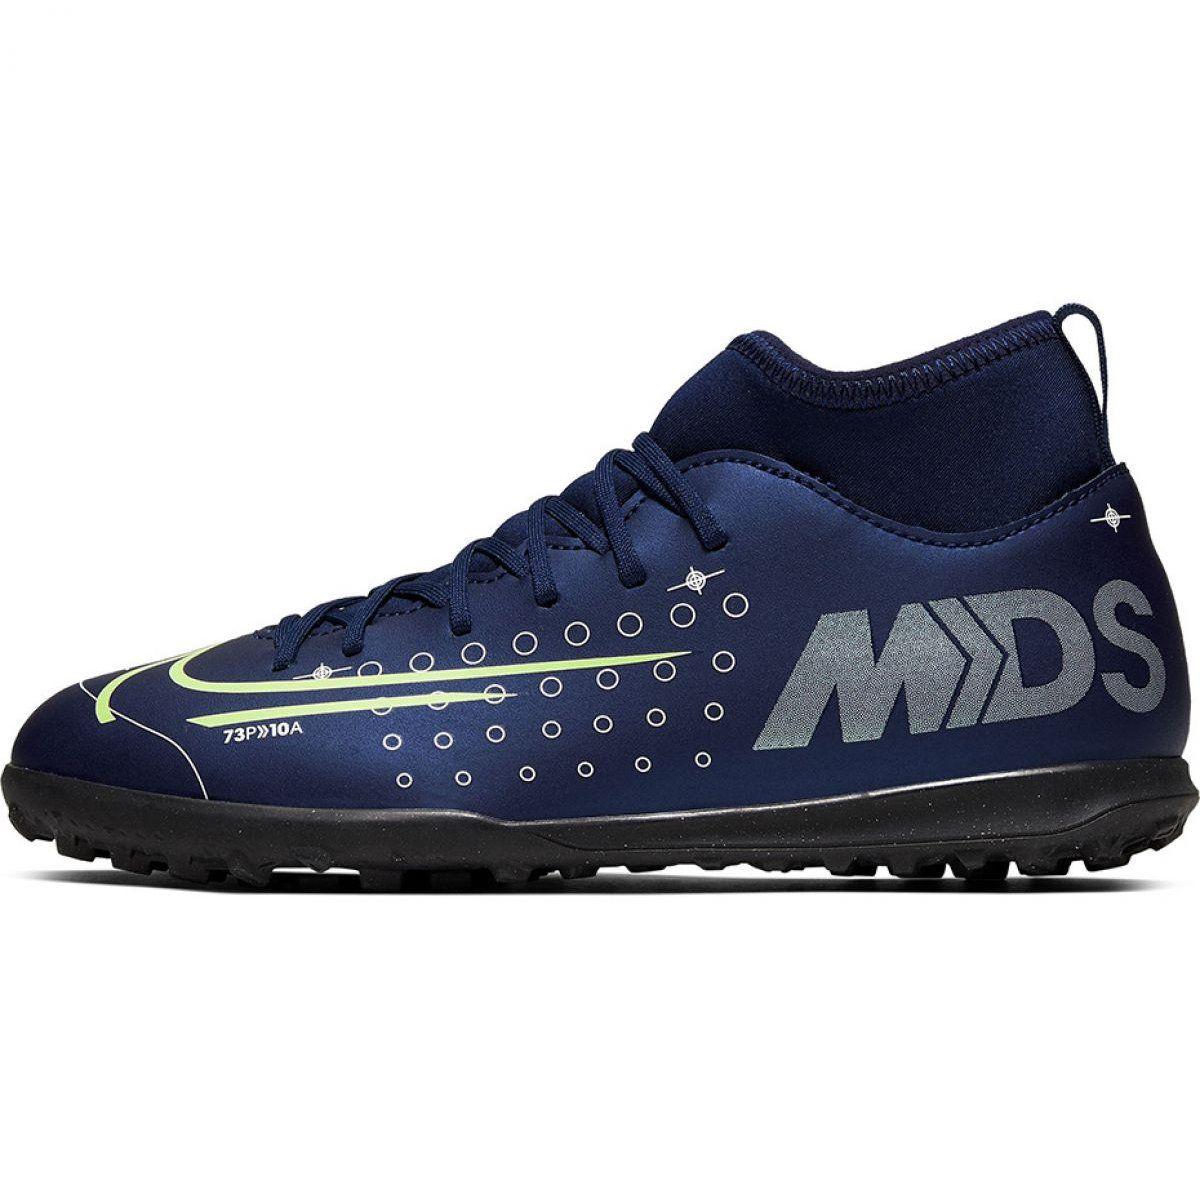 Buty Pilkarskie Nike Mercurial Superfly 7 Club Mds Tf Jr Bq5416 401 Granatowe Granatowe Football Shoes Superfly Shoes